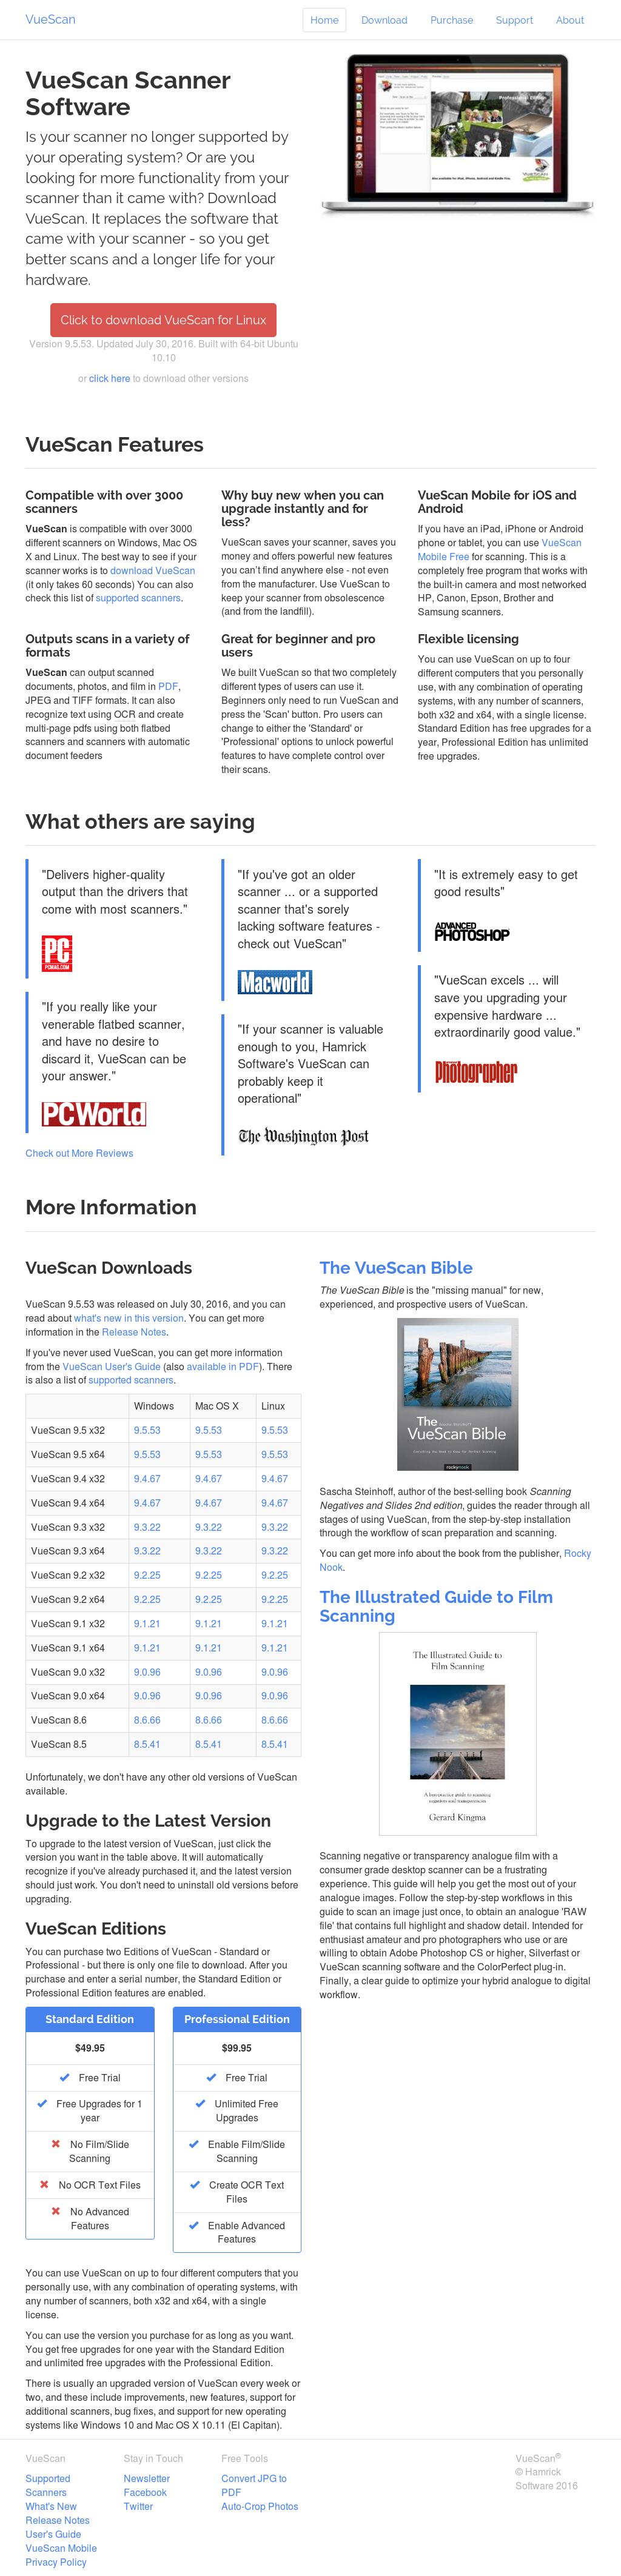 Owler Reports - Press Release: VueScan : Hamrick Software Reaches